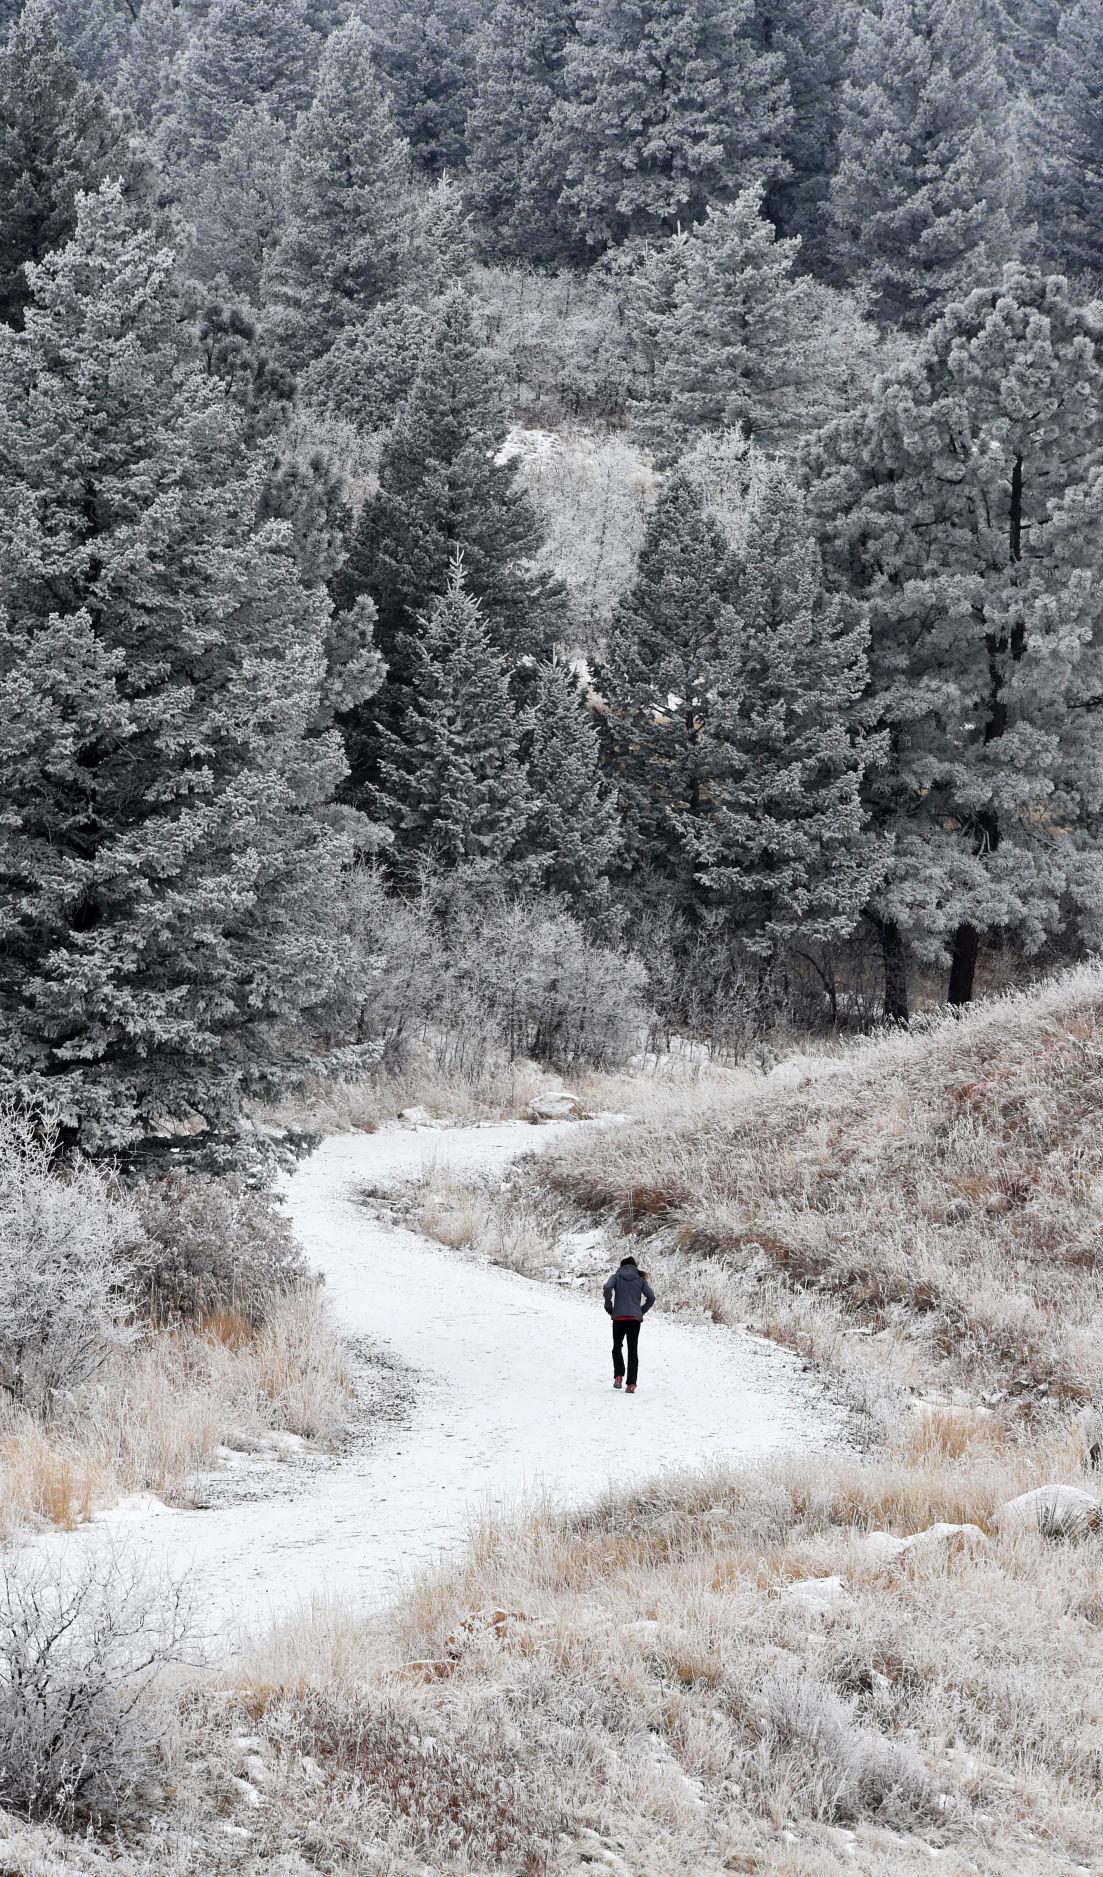 Storied Blodgett Peak Open Space offers sweeping views of northern Colorado Springs